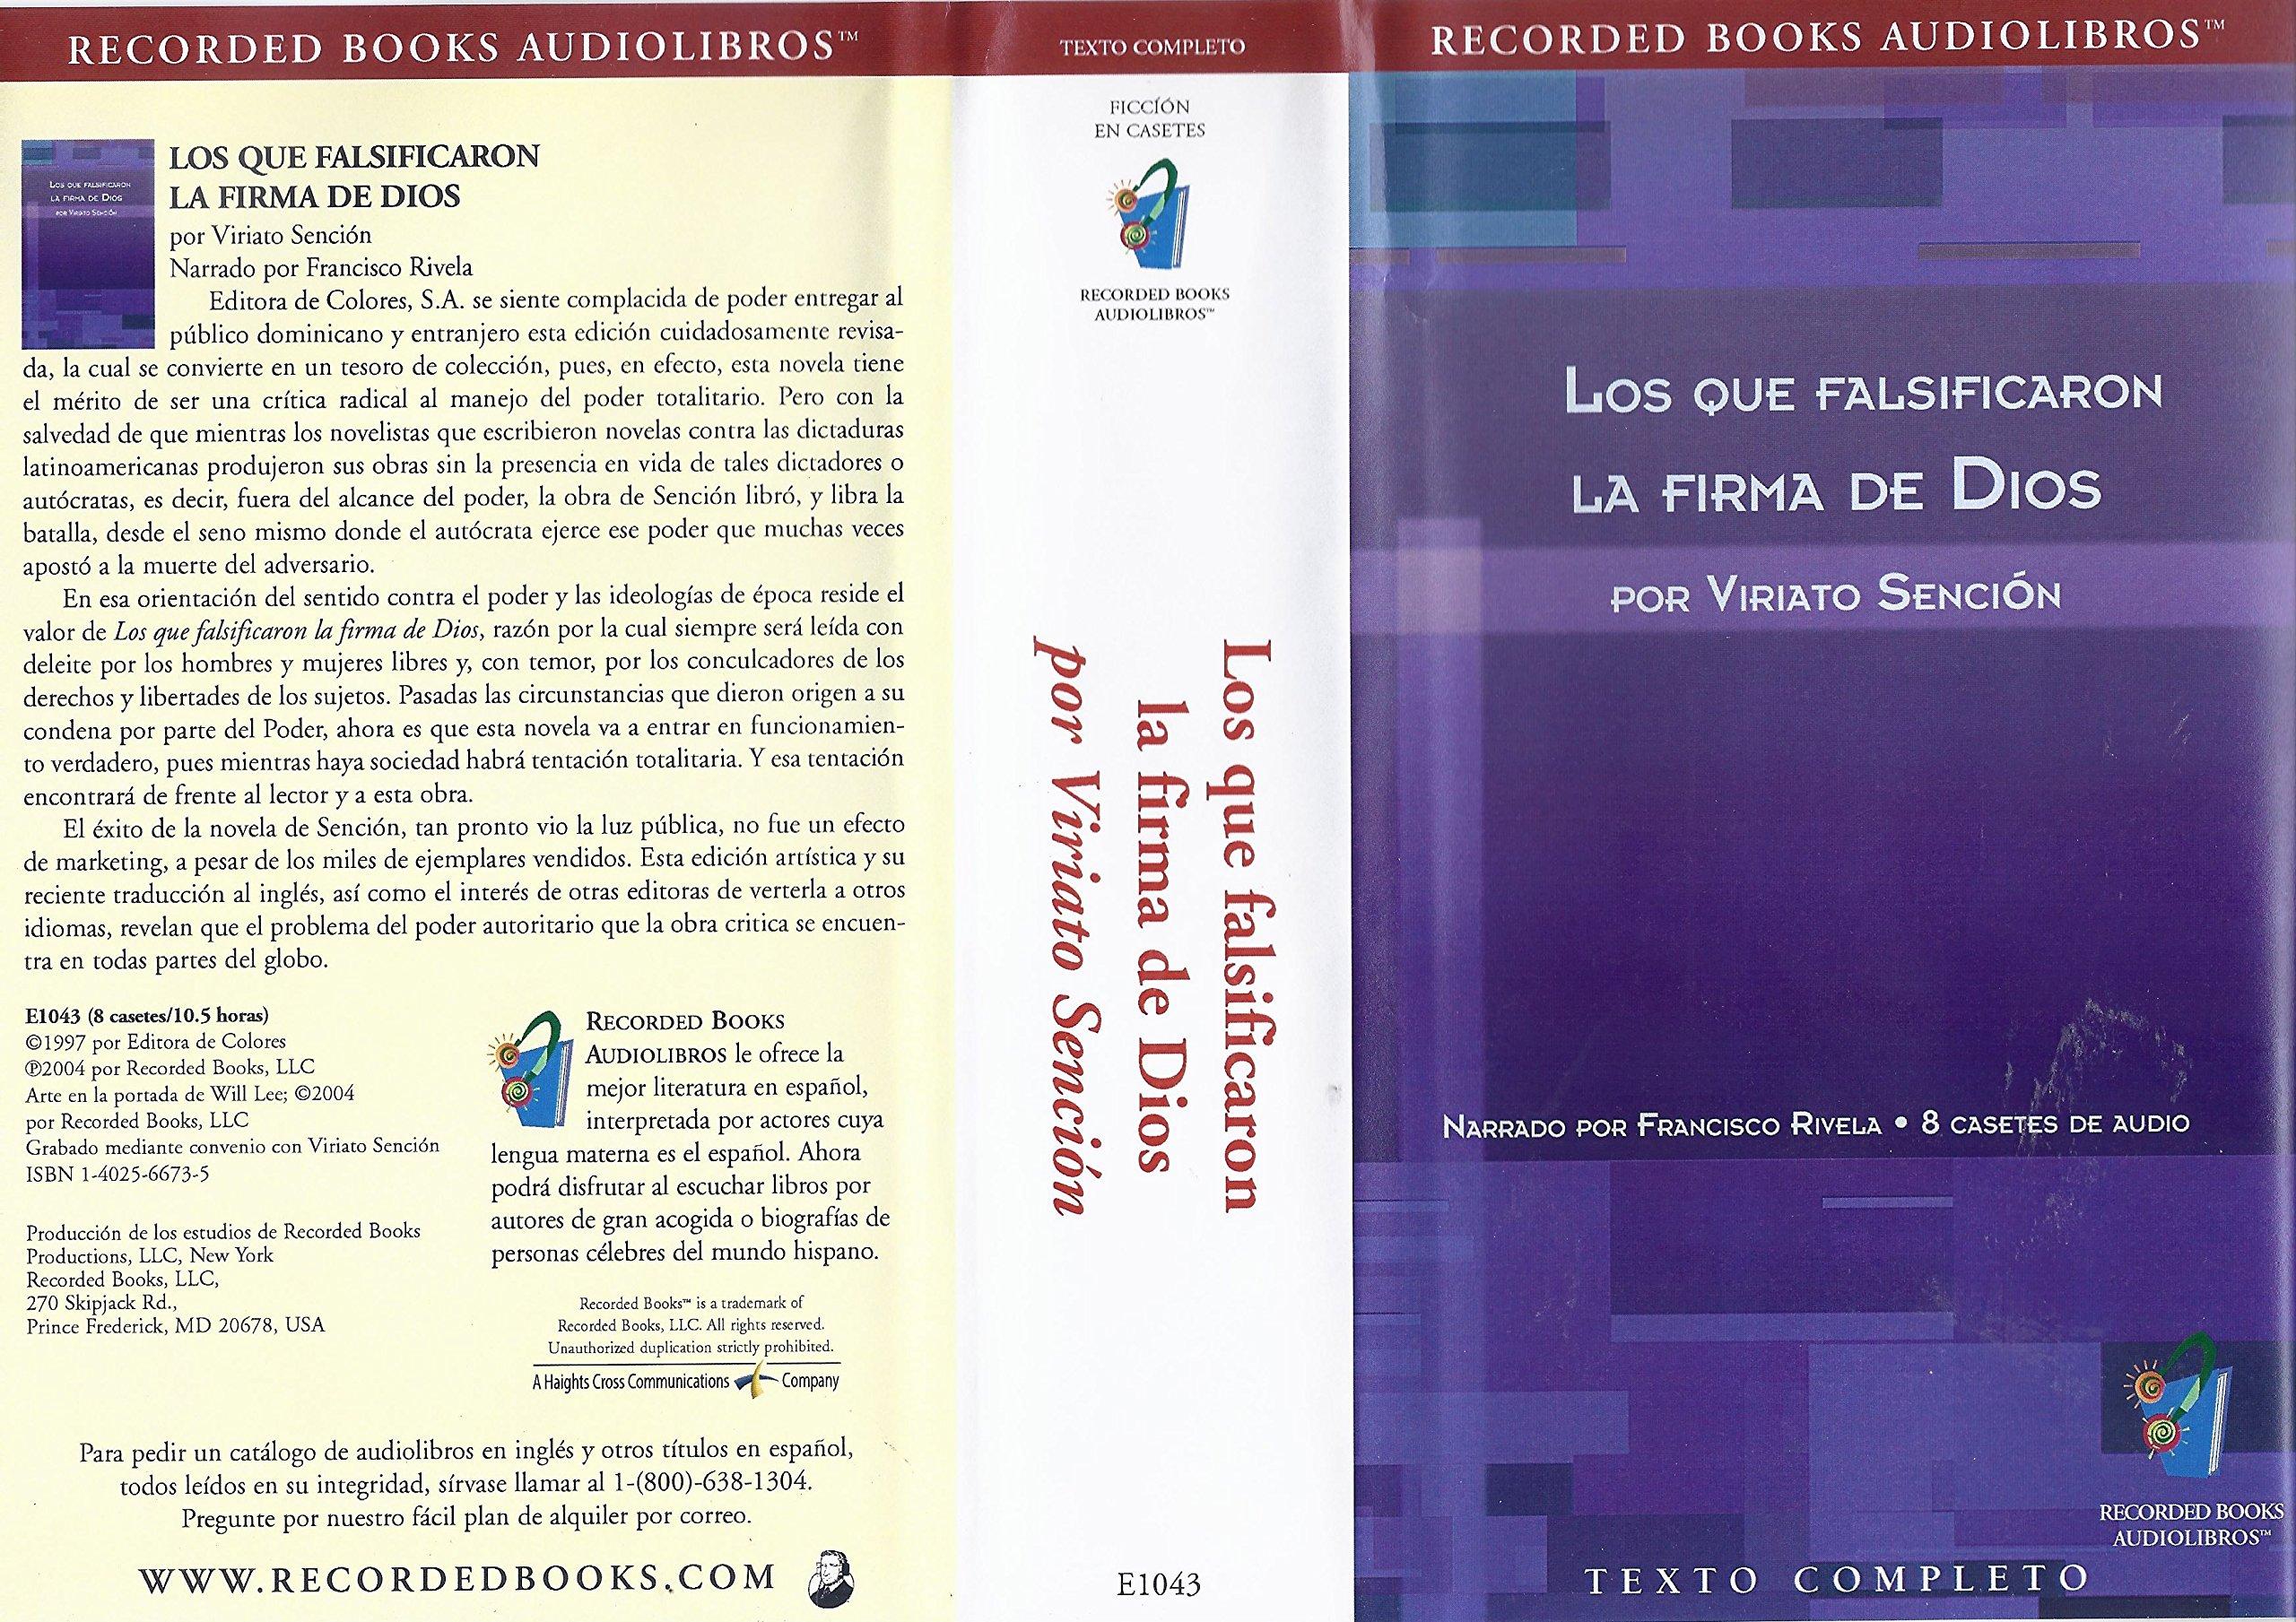 Los Que Falsificaron La Firma De Dios POR Viriato Sencion: VIRIATO SENCION: 9781402566738: Amazon.com: Books